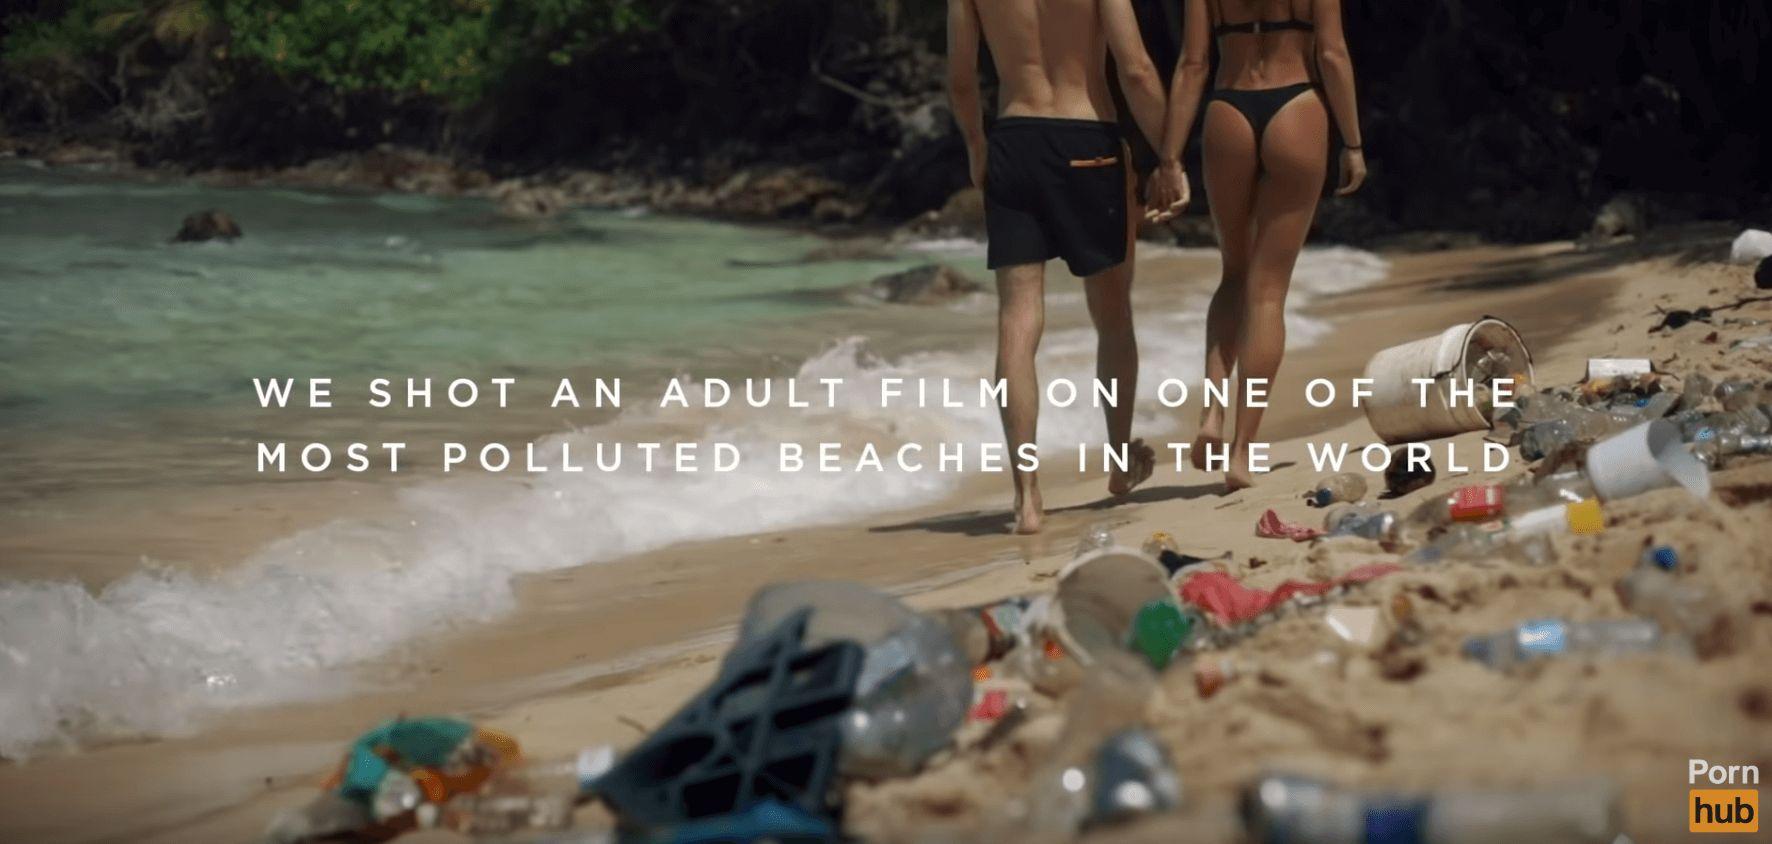 Beach Porn Film pornhub has made a film on a littered beach to raise money